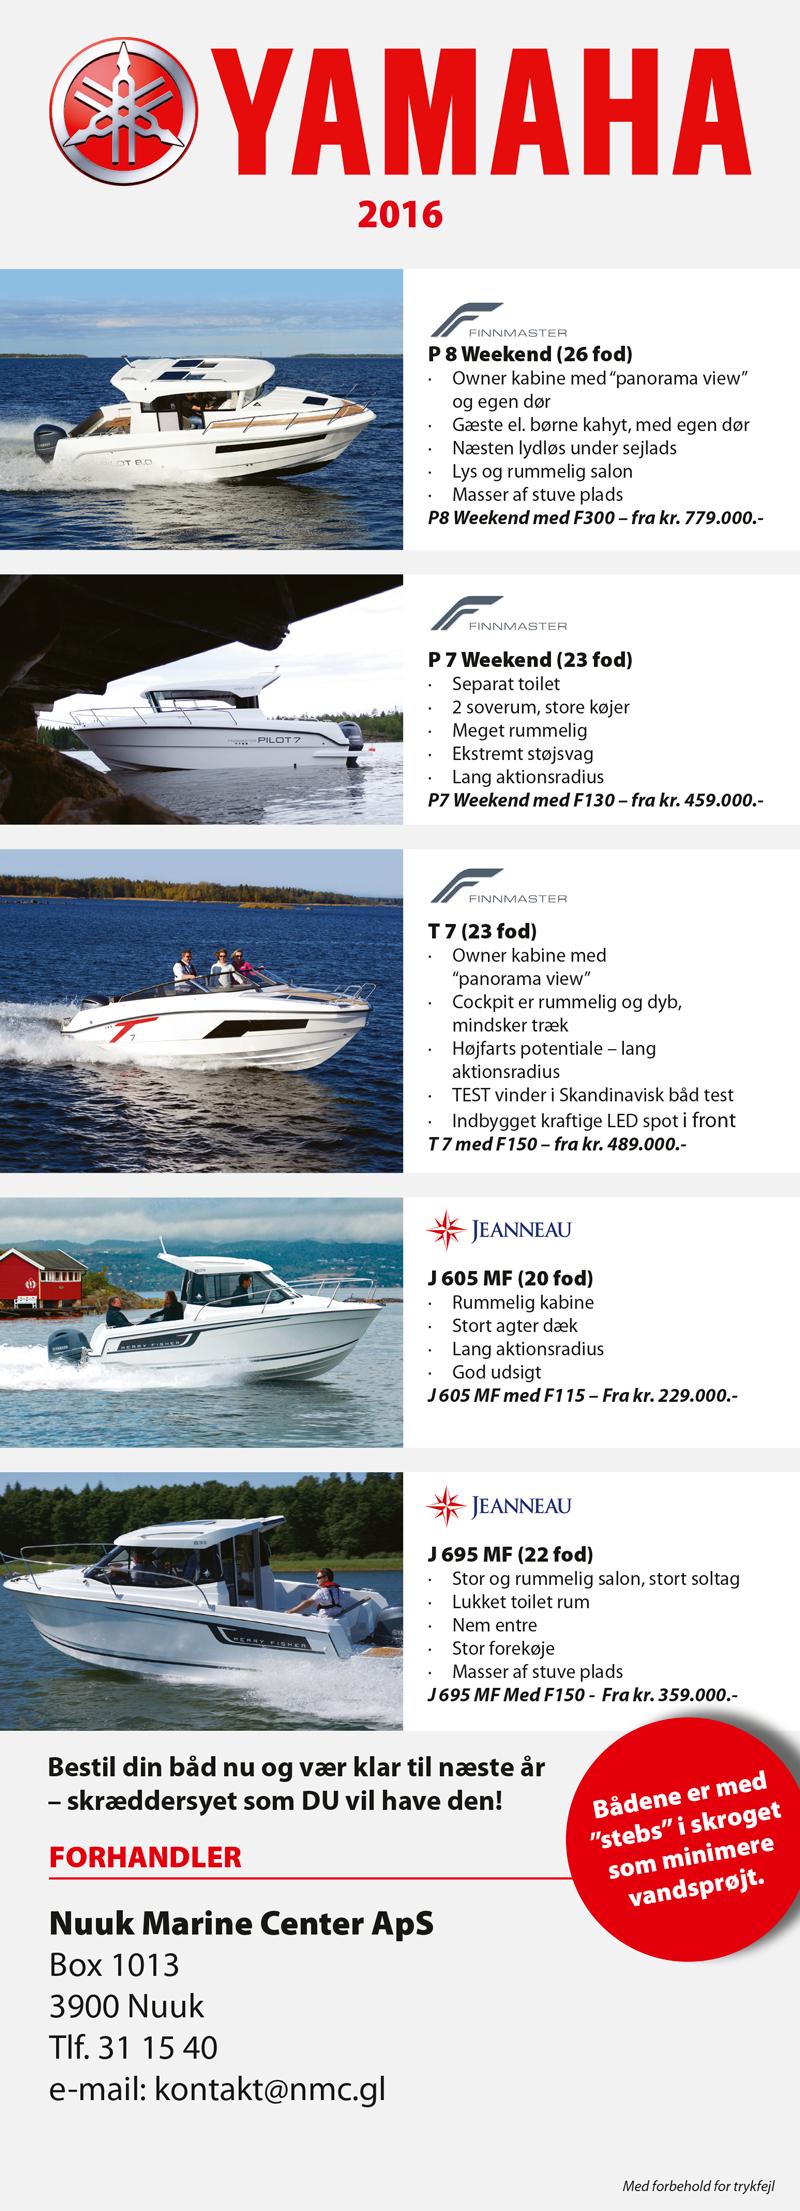 YMS_Boat_NMC